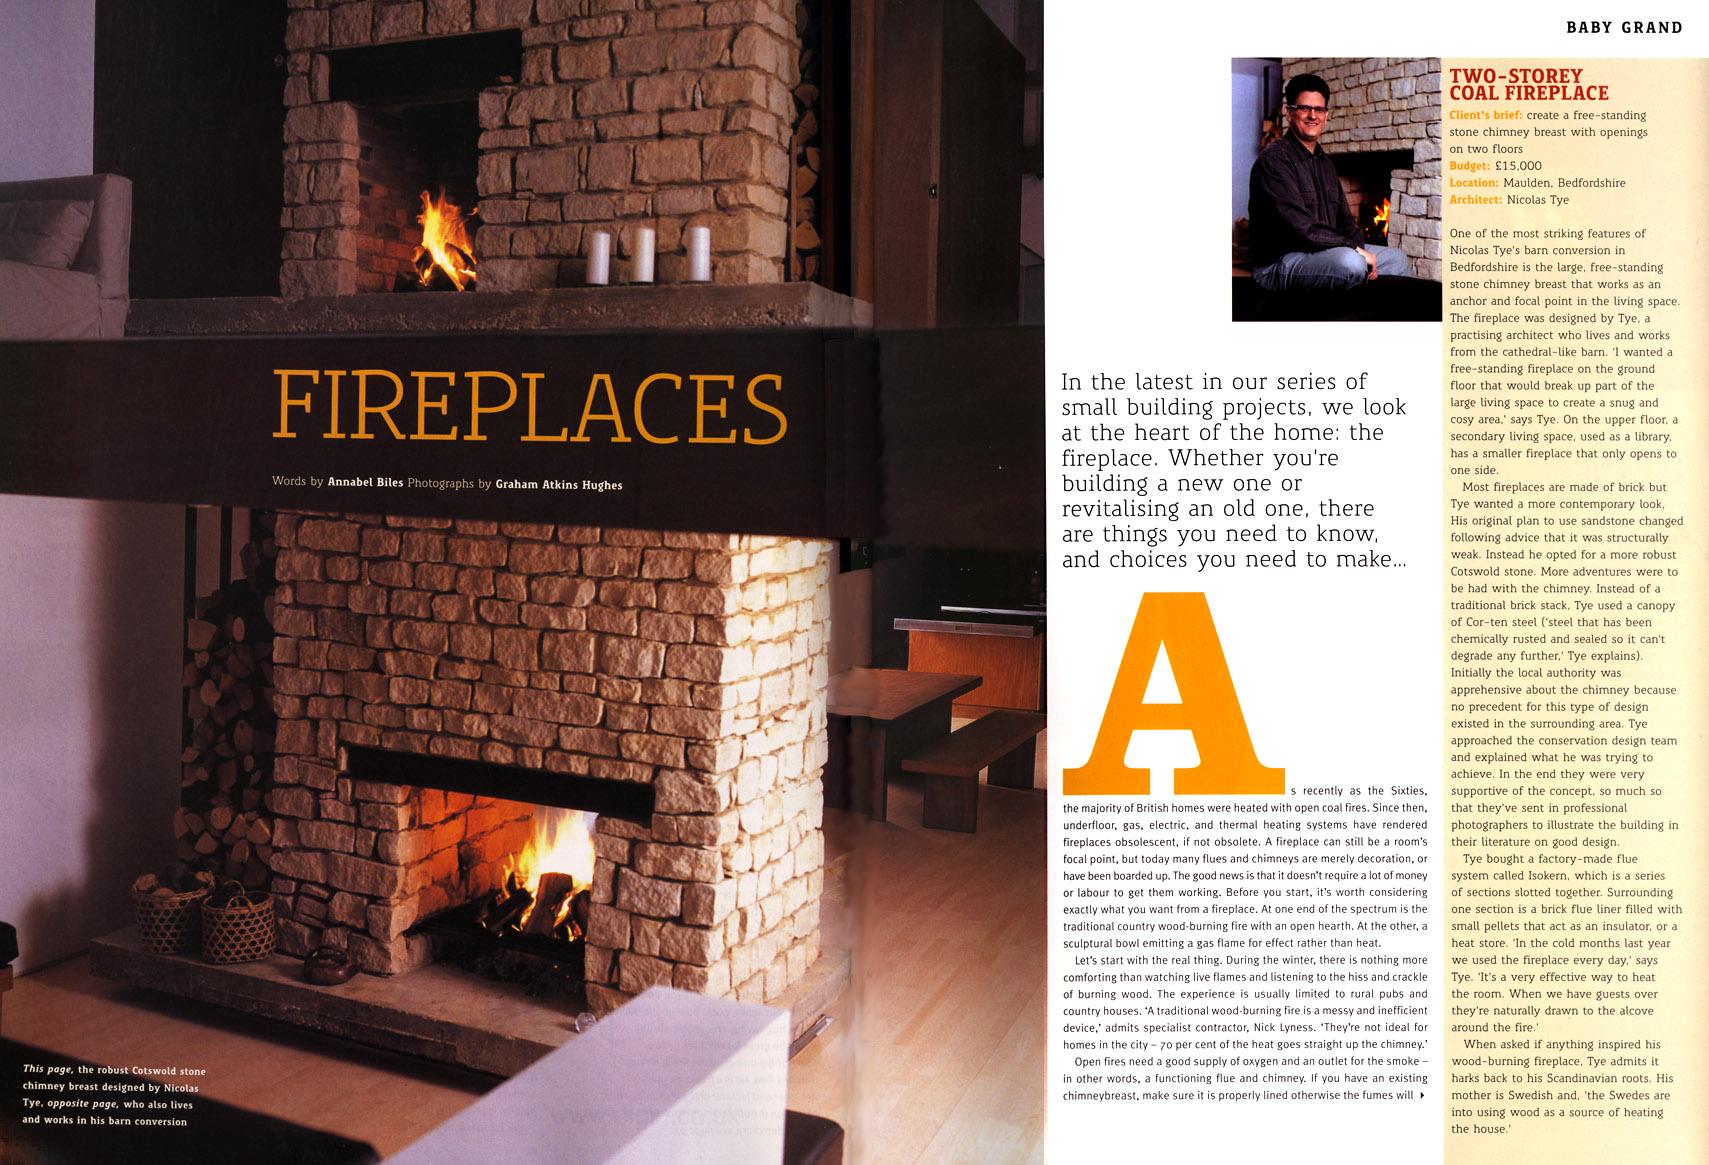 grand design 2004 nicolas tye architects. Black Bedroom Furniture Sets. Home Design Ideas